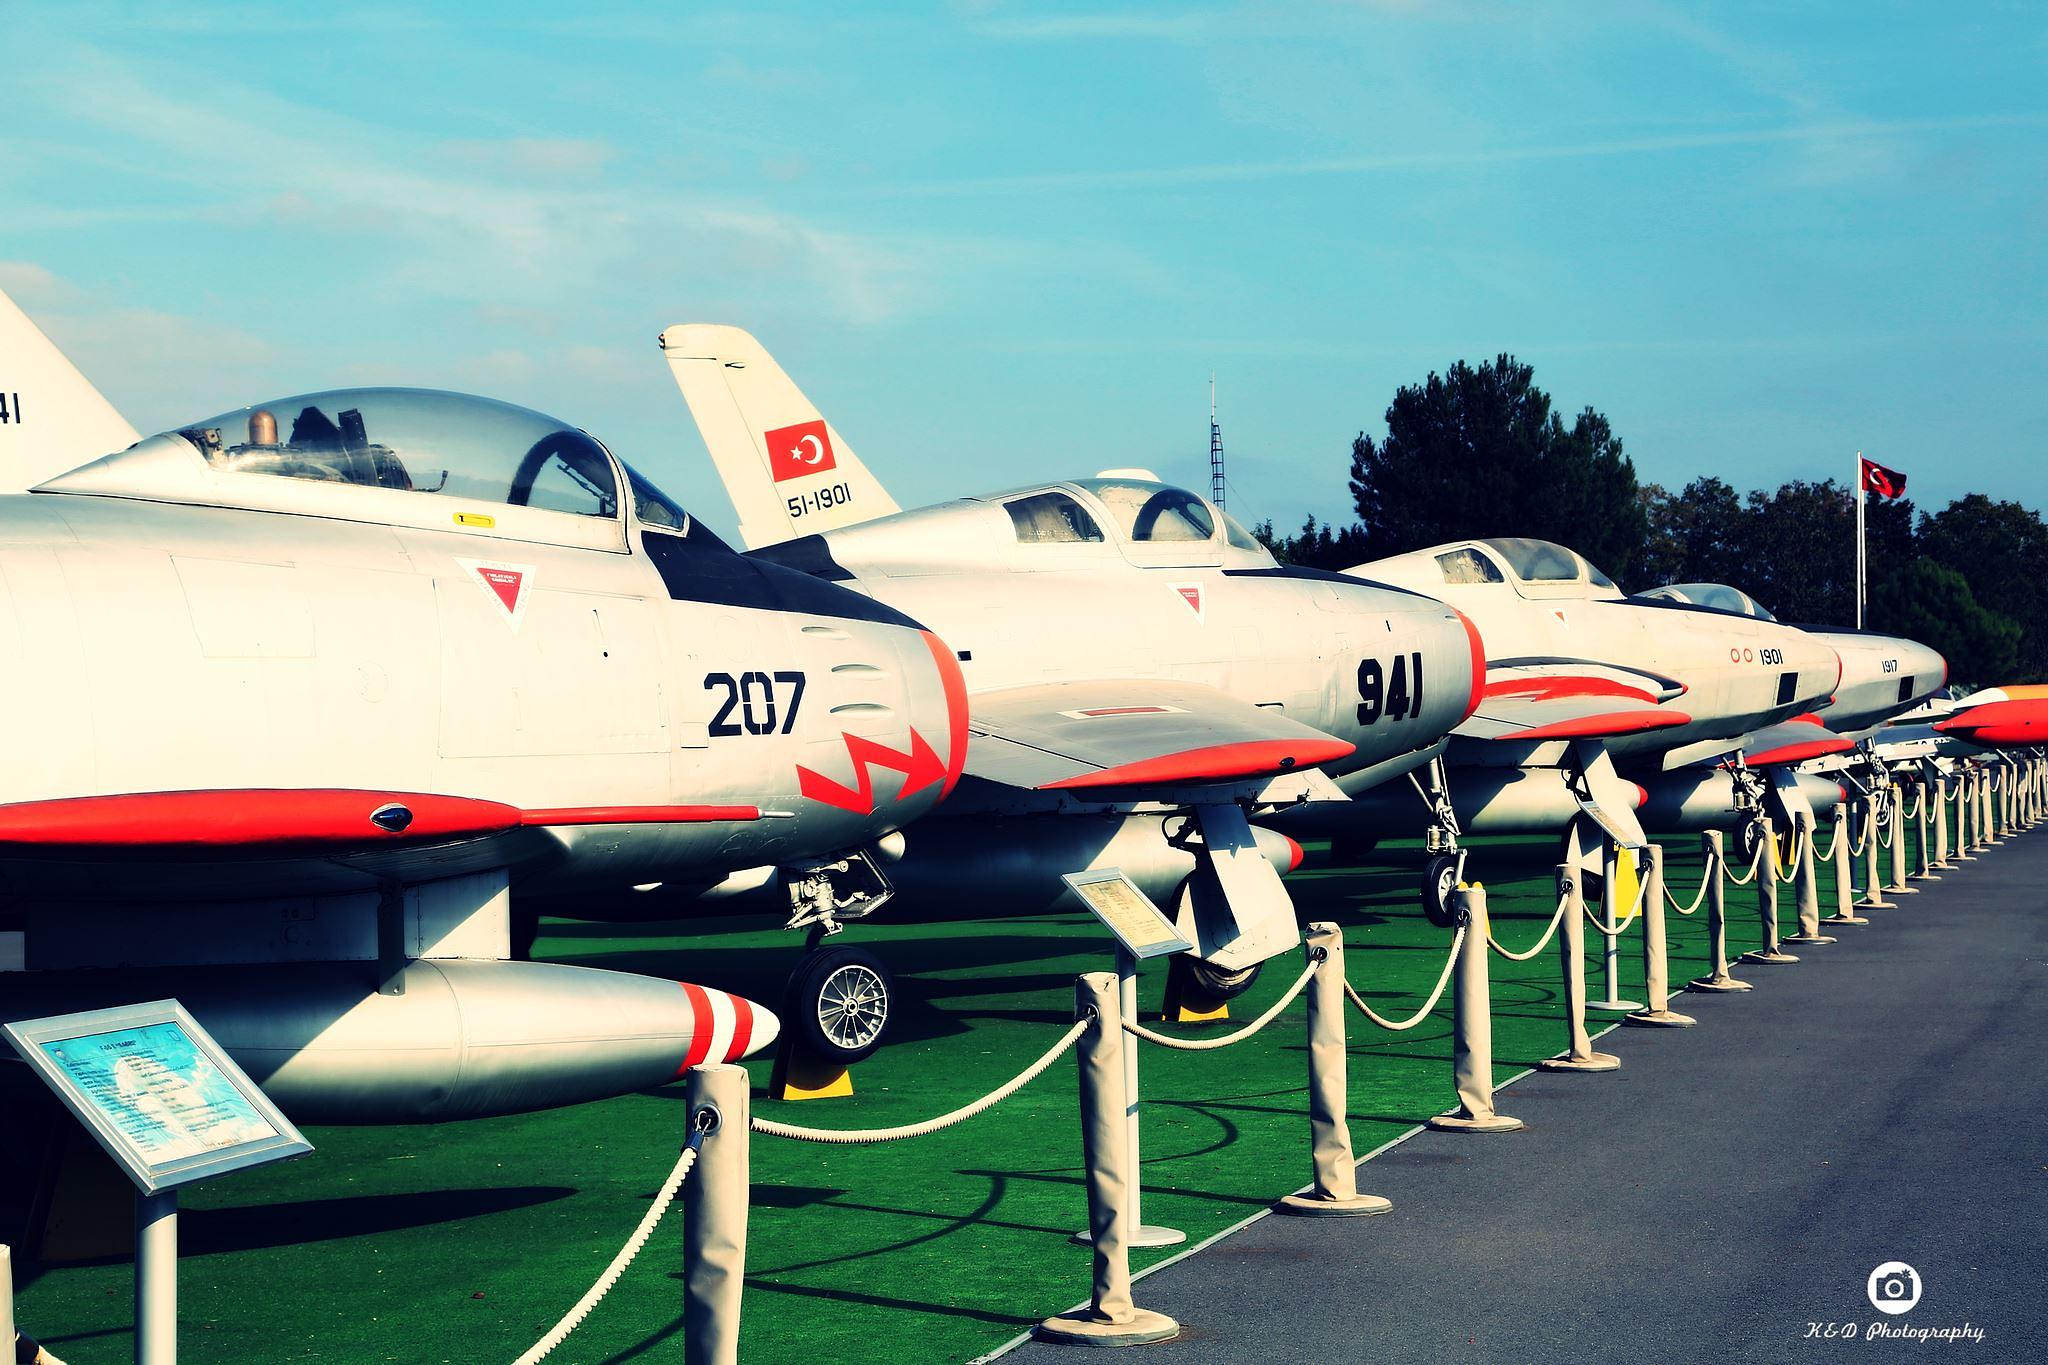 Yesilkoy Aviation Museum / Turkey by KIVANÇ CANGÜLENÇ